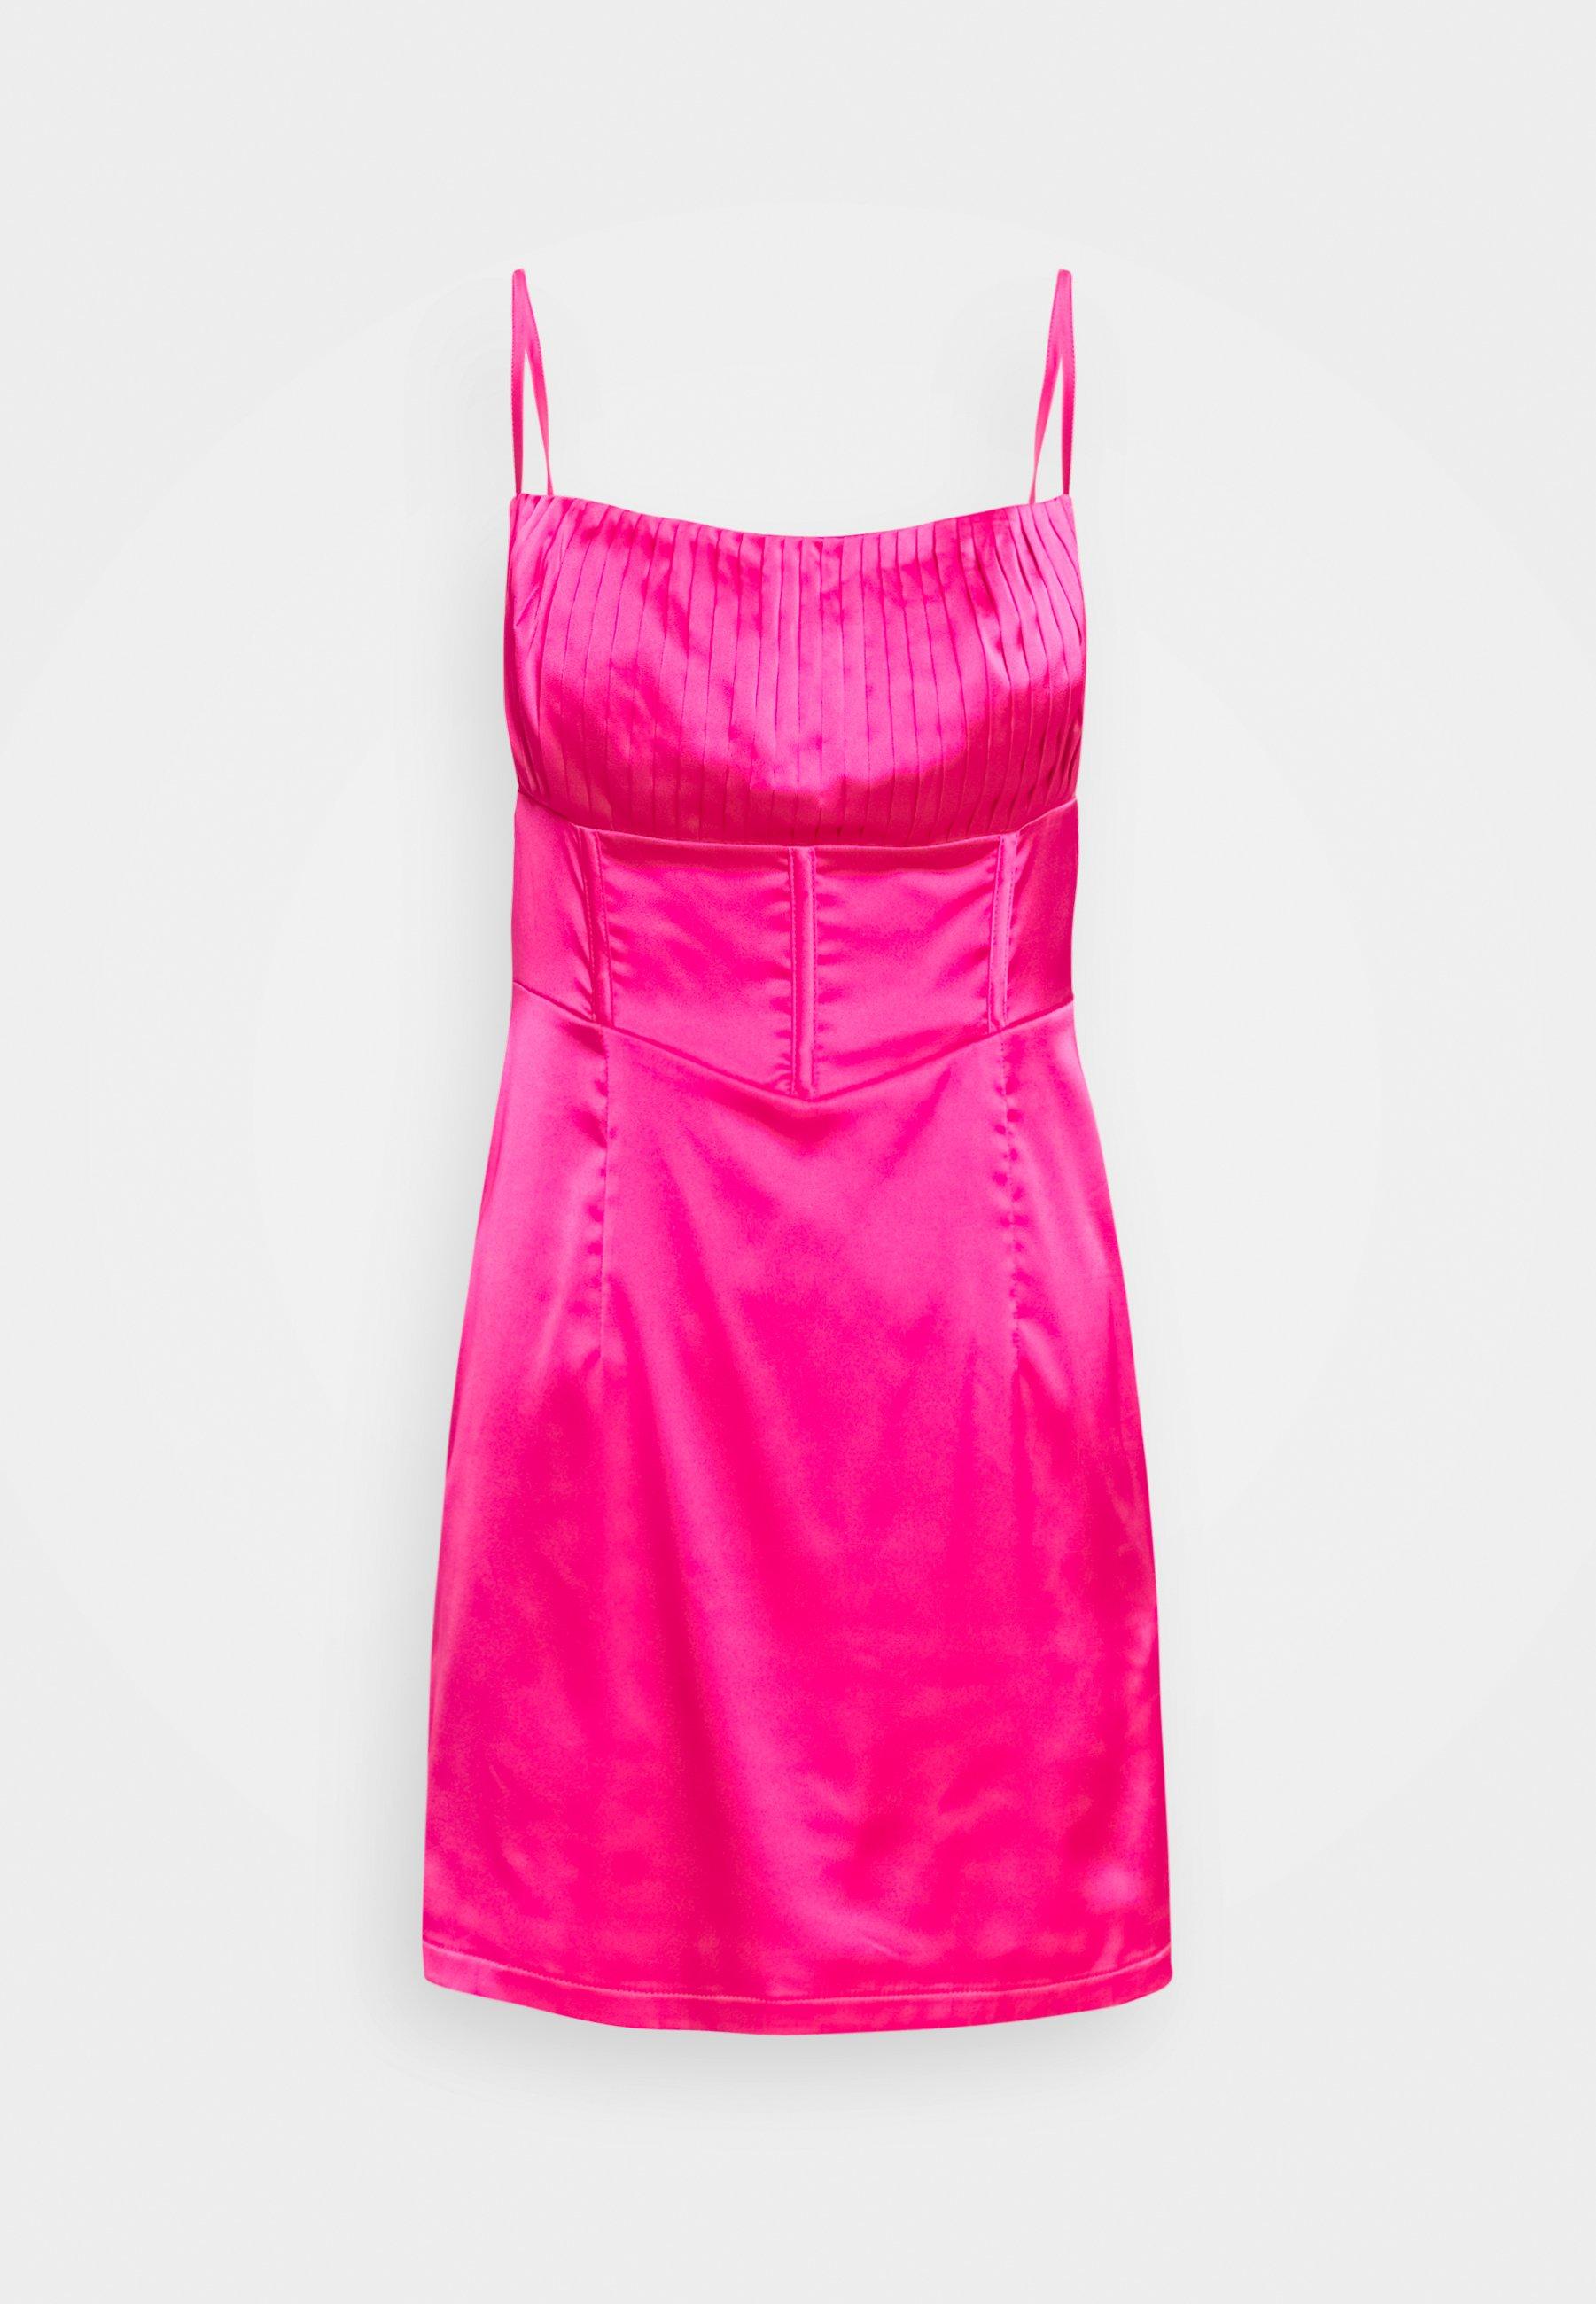 Femme PLEAT DETAIL STRAPPY BODYCON MINI DRESS - Robe de soirée